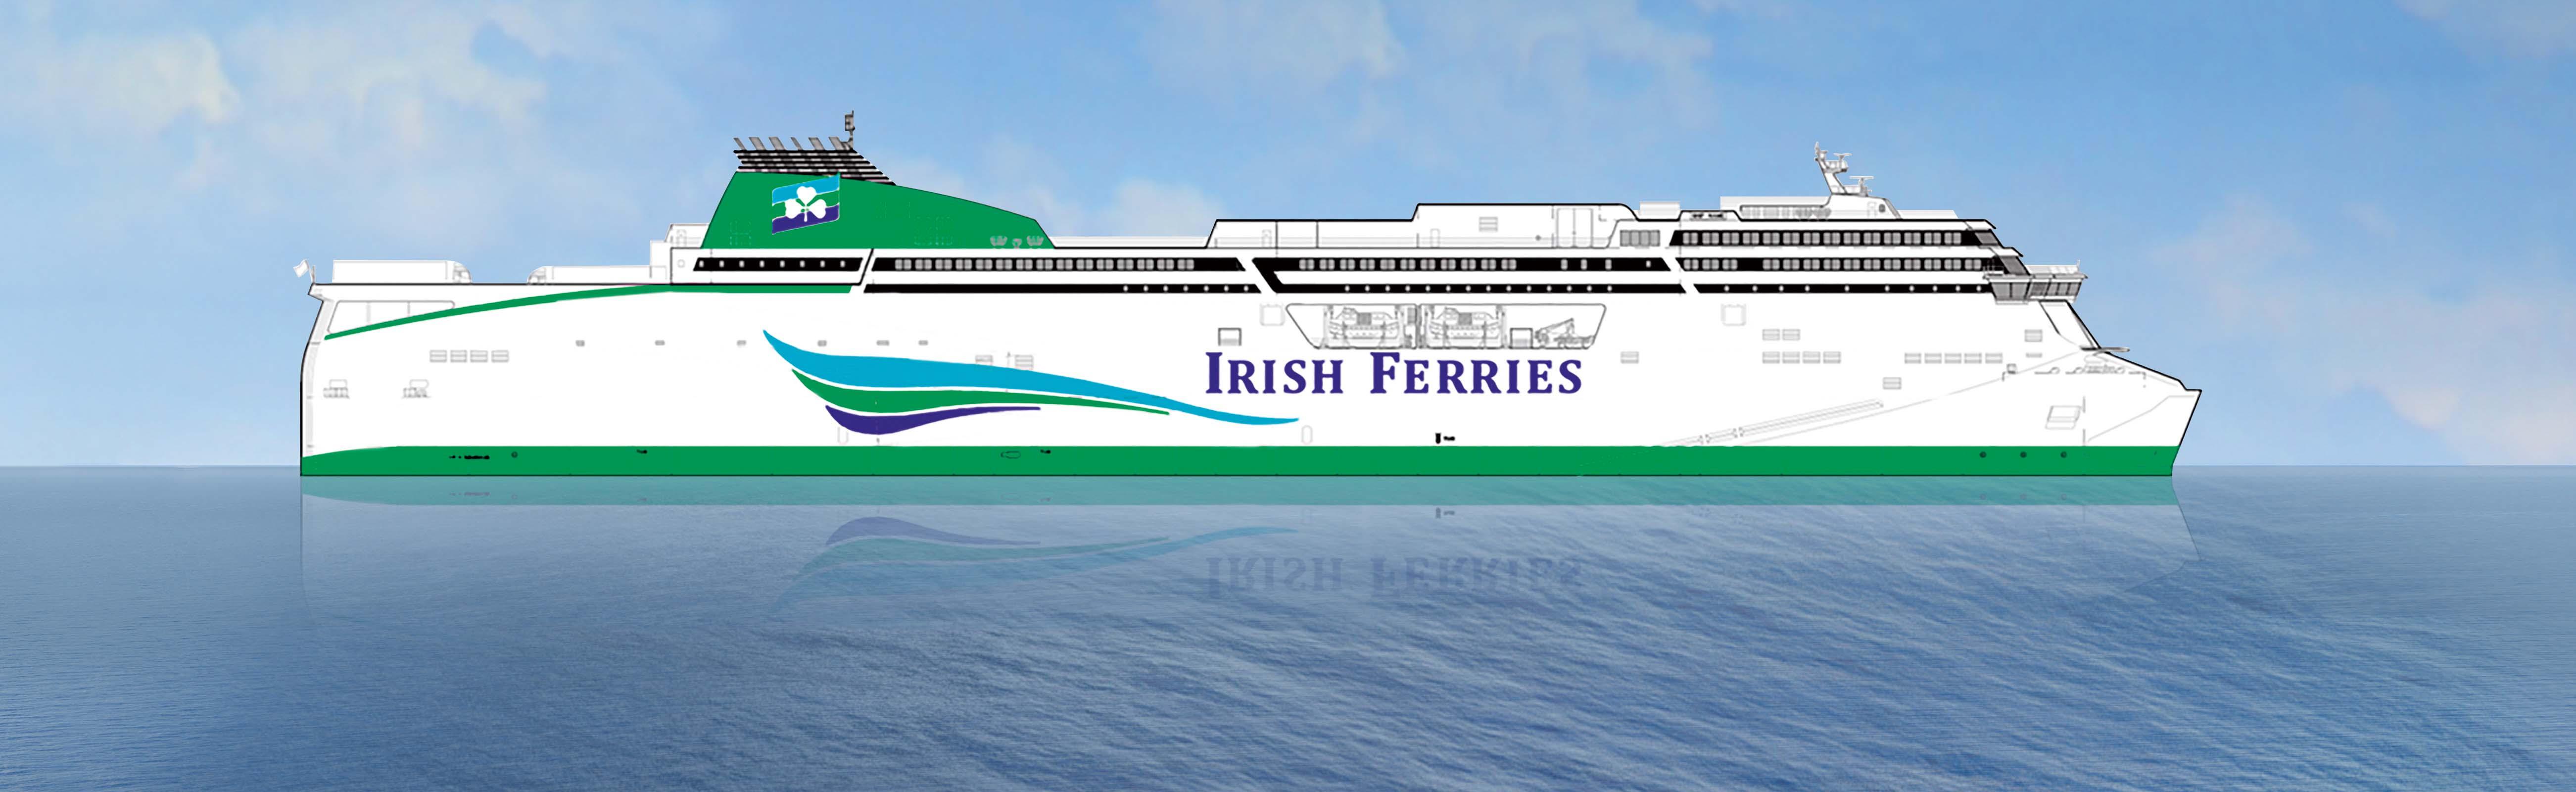 Irish Ferries to add new €165m ferry on Dublin-Holyhead route